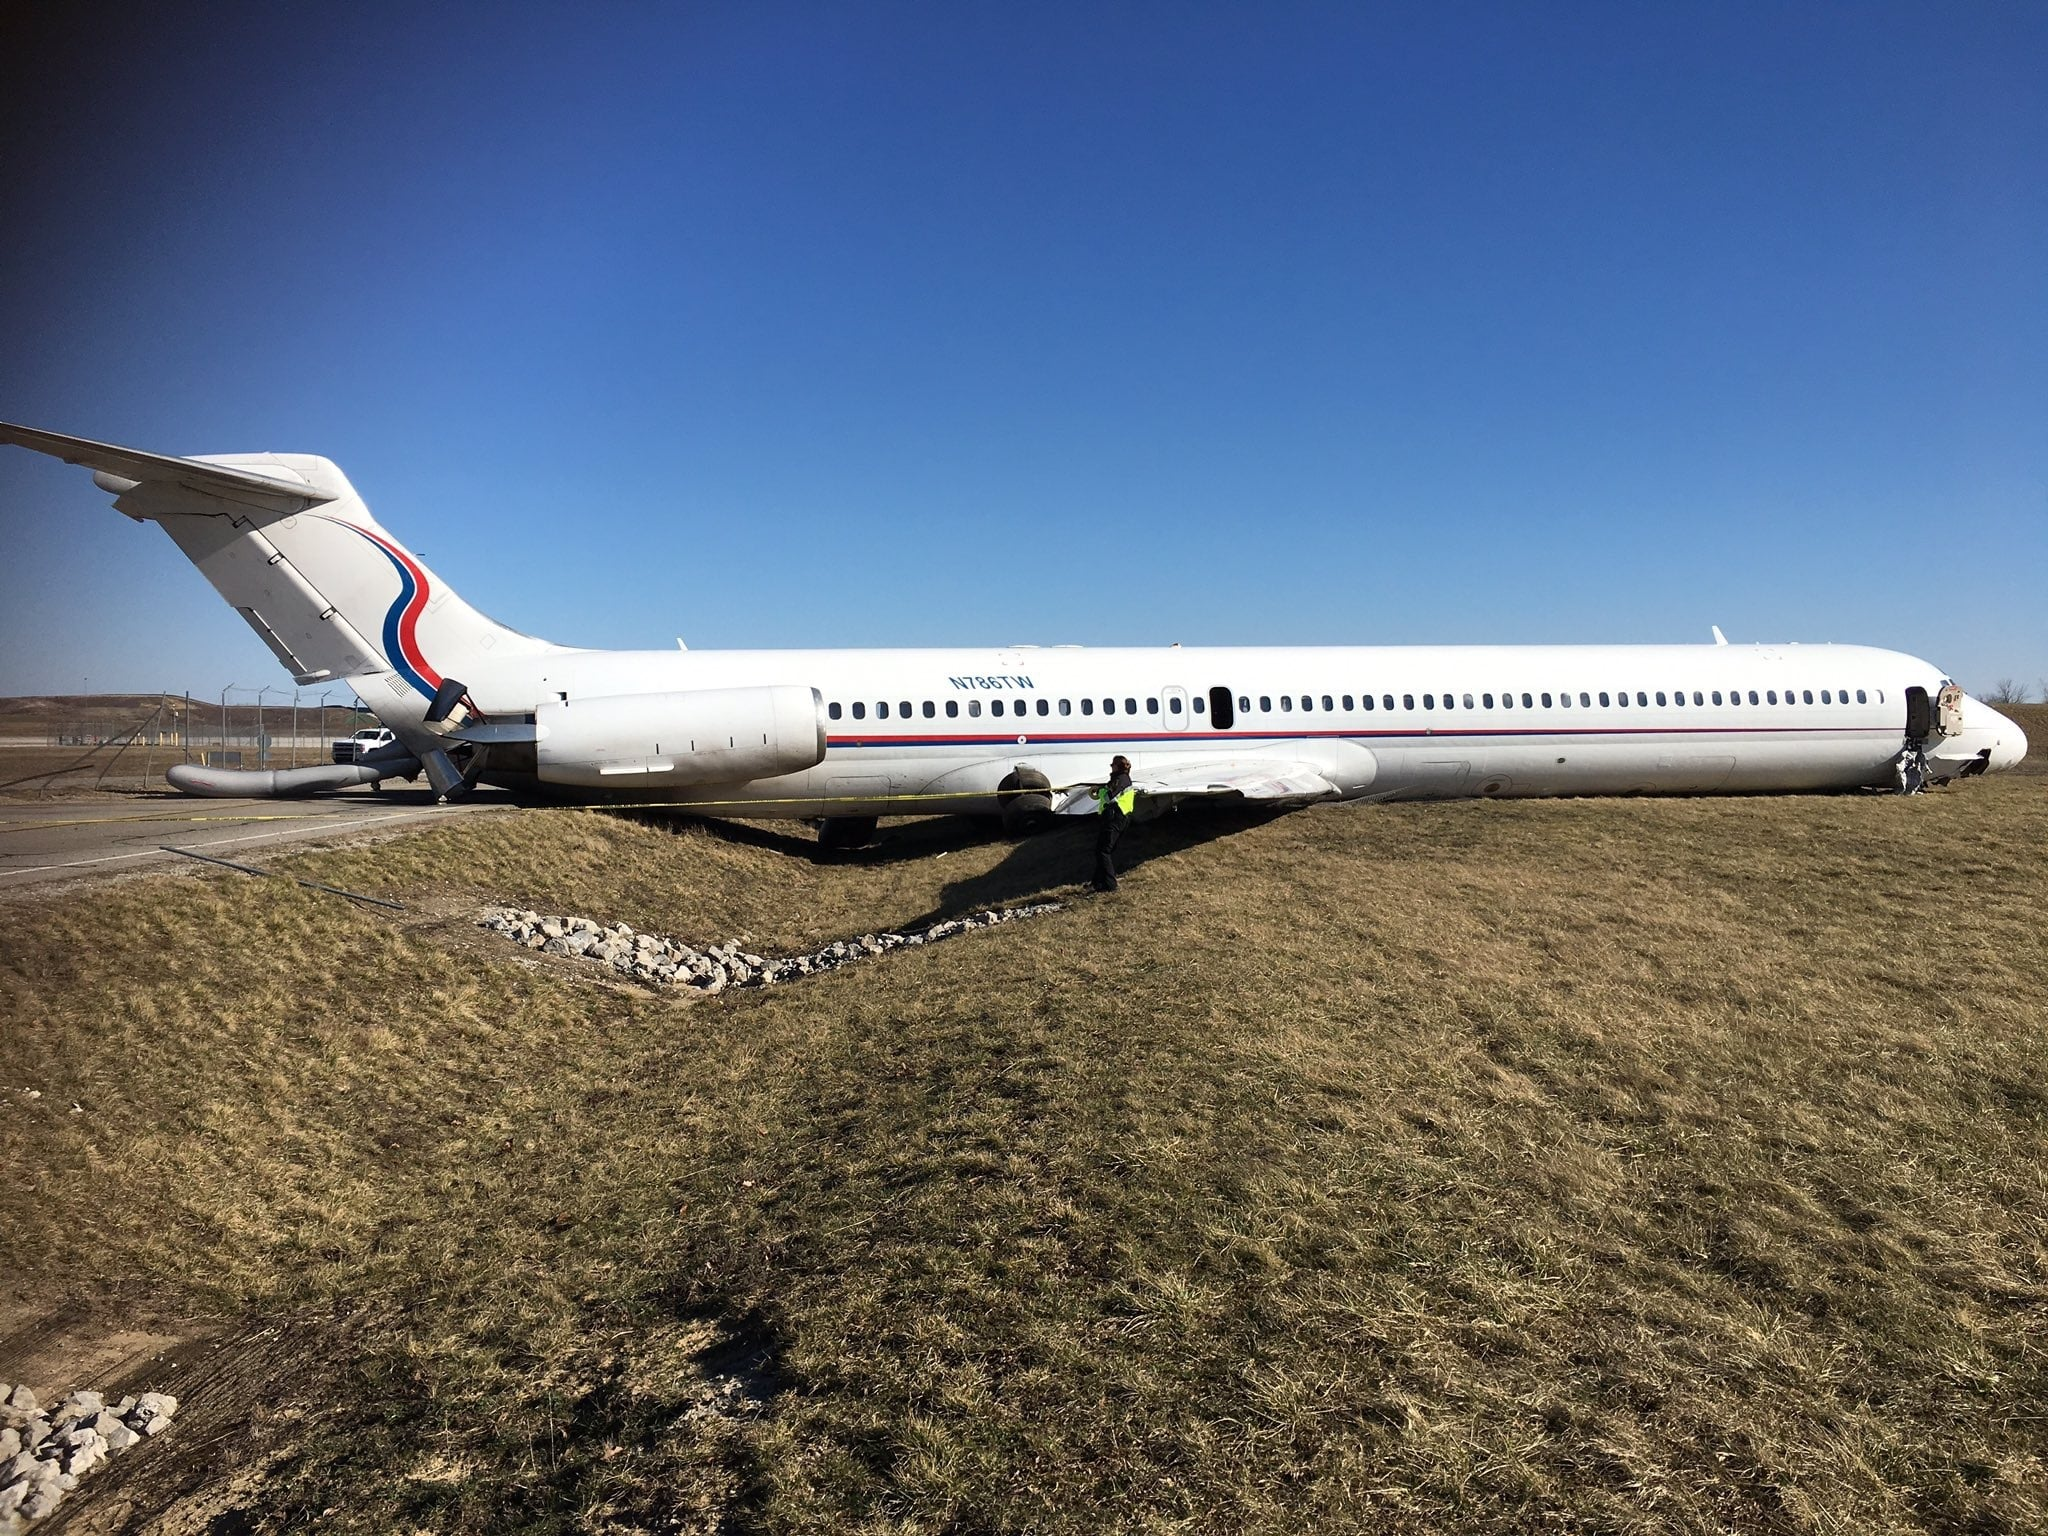 aircraft overrun runway